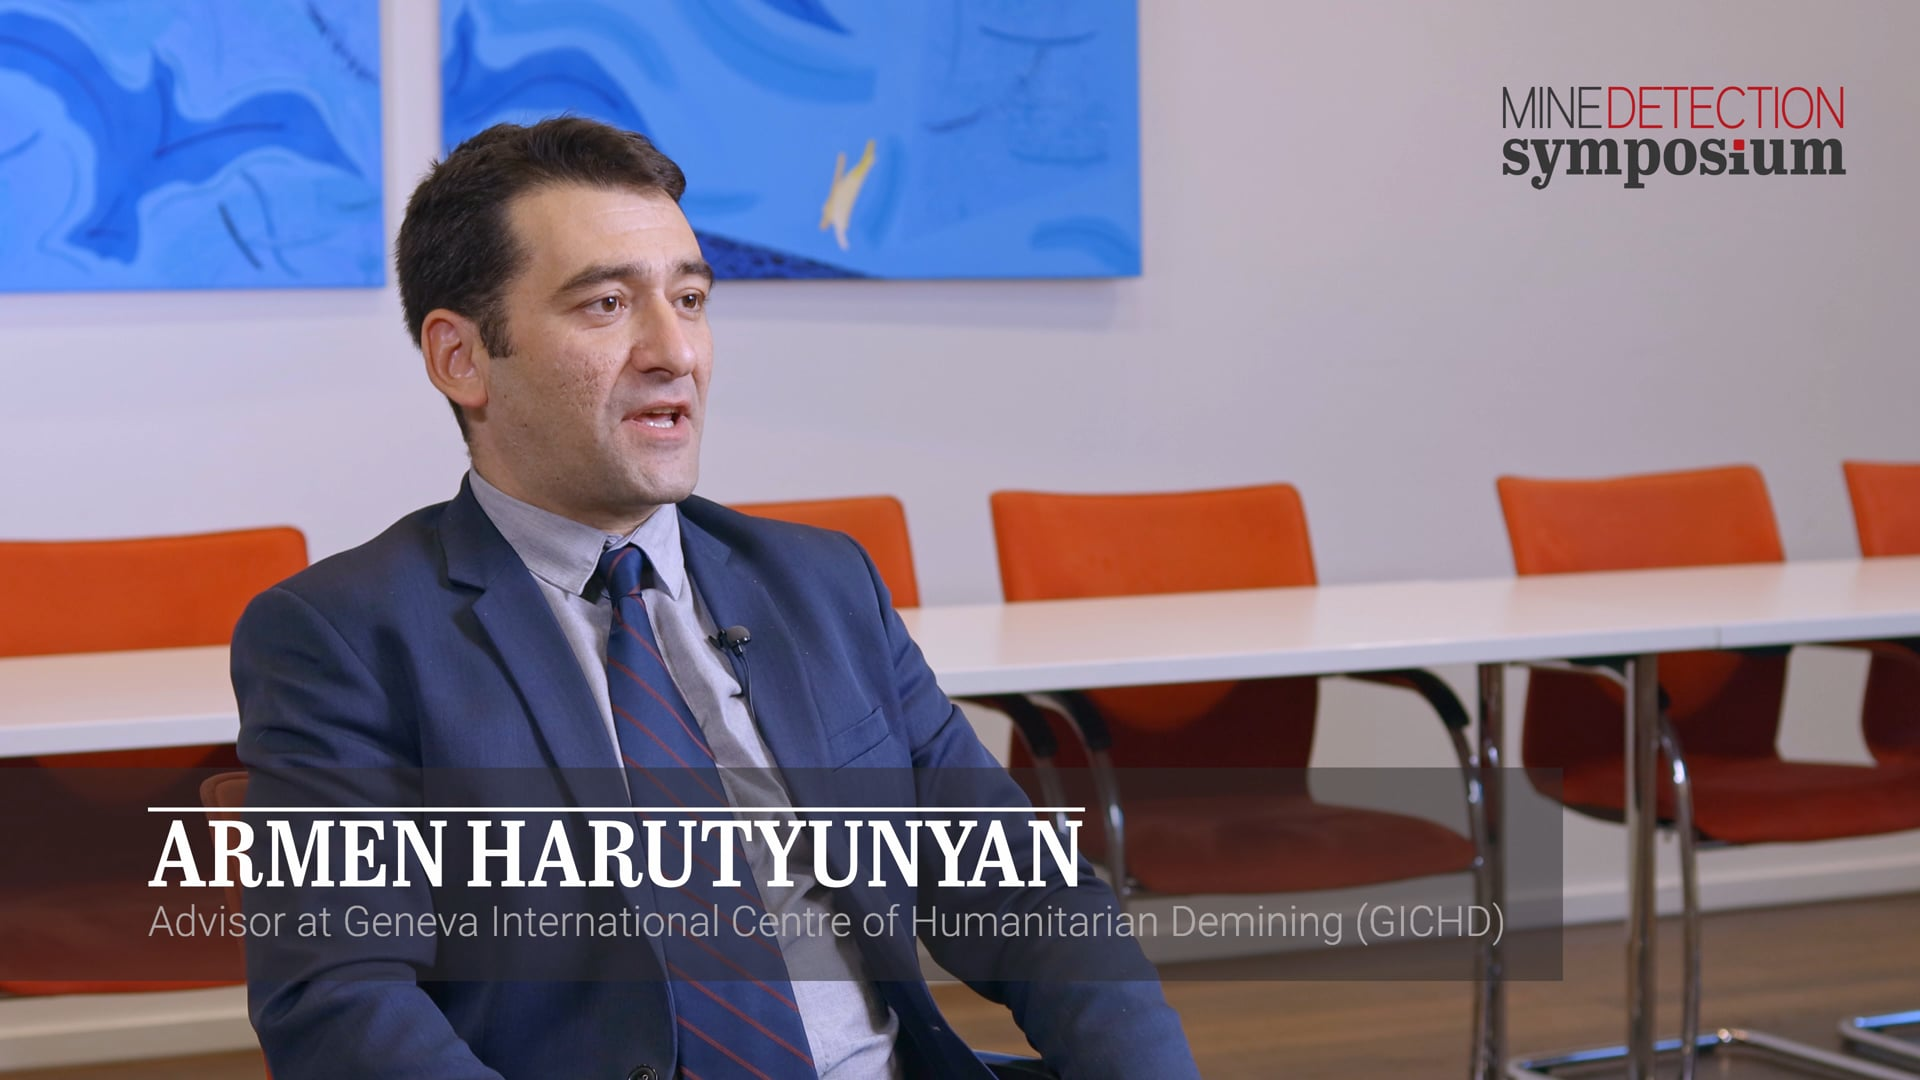 Armen Harutyunyan - Future of demining - Mine Detection Symposium 2019